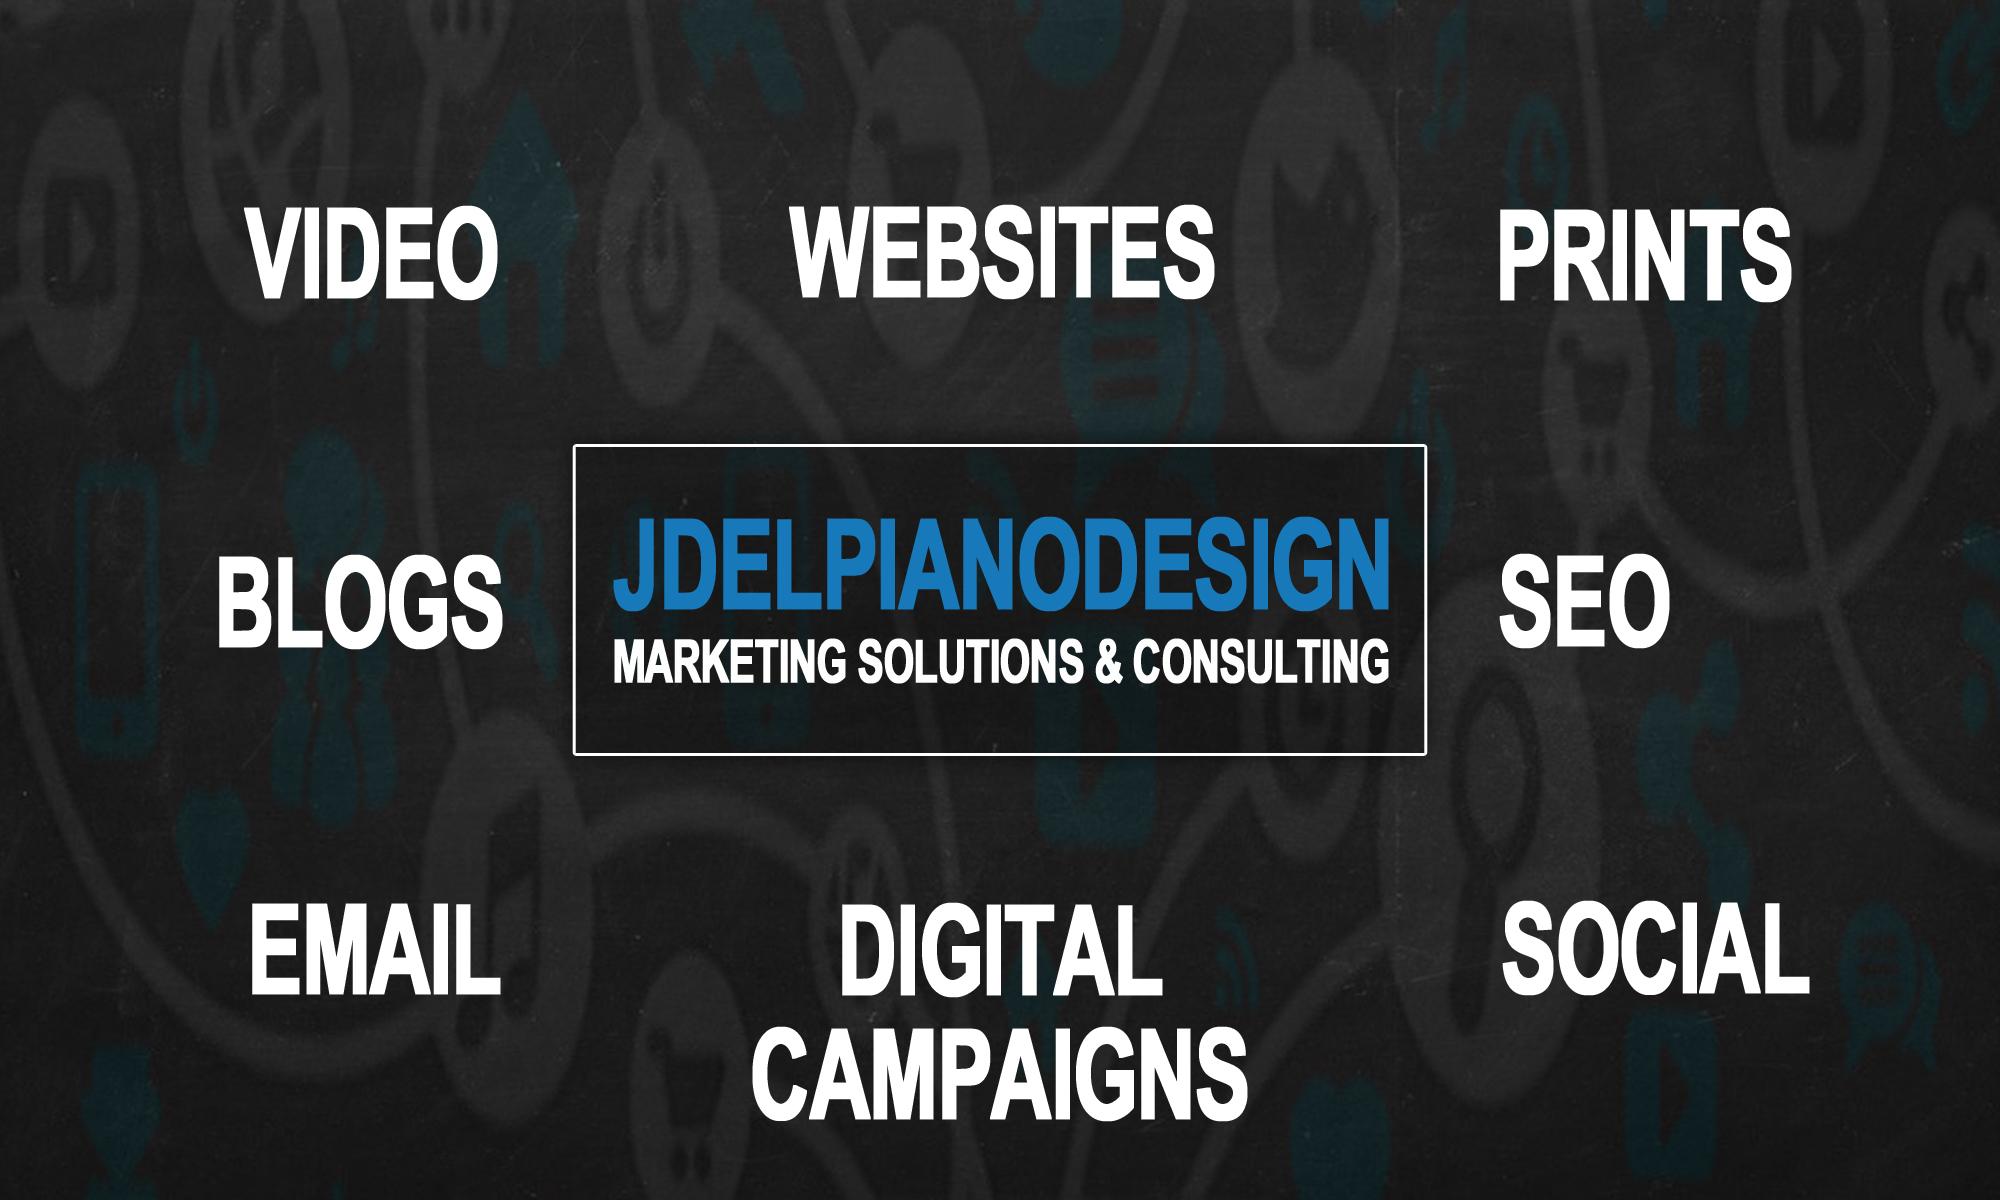 JDelPianoDesign